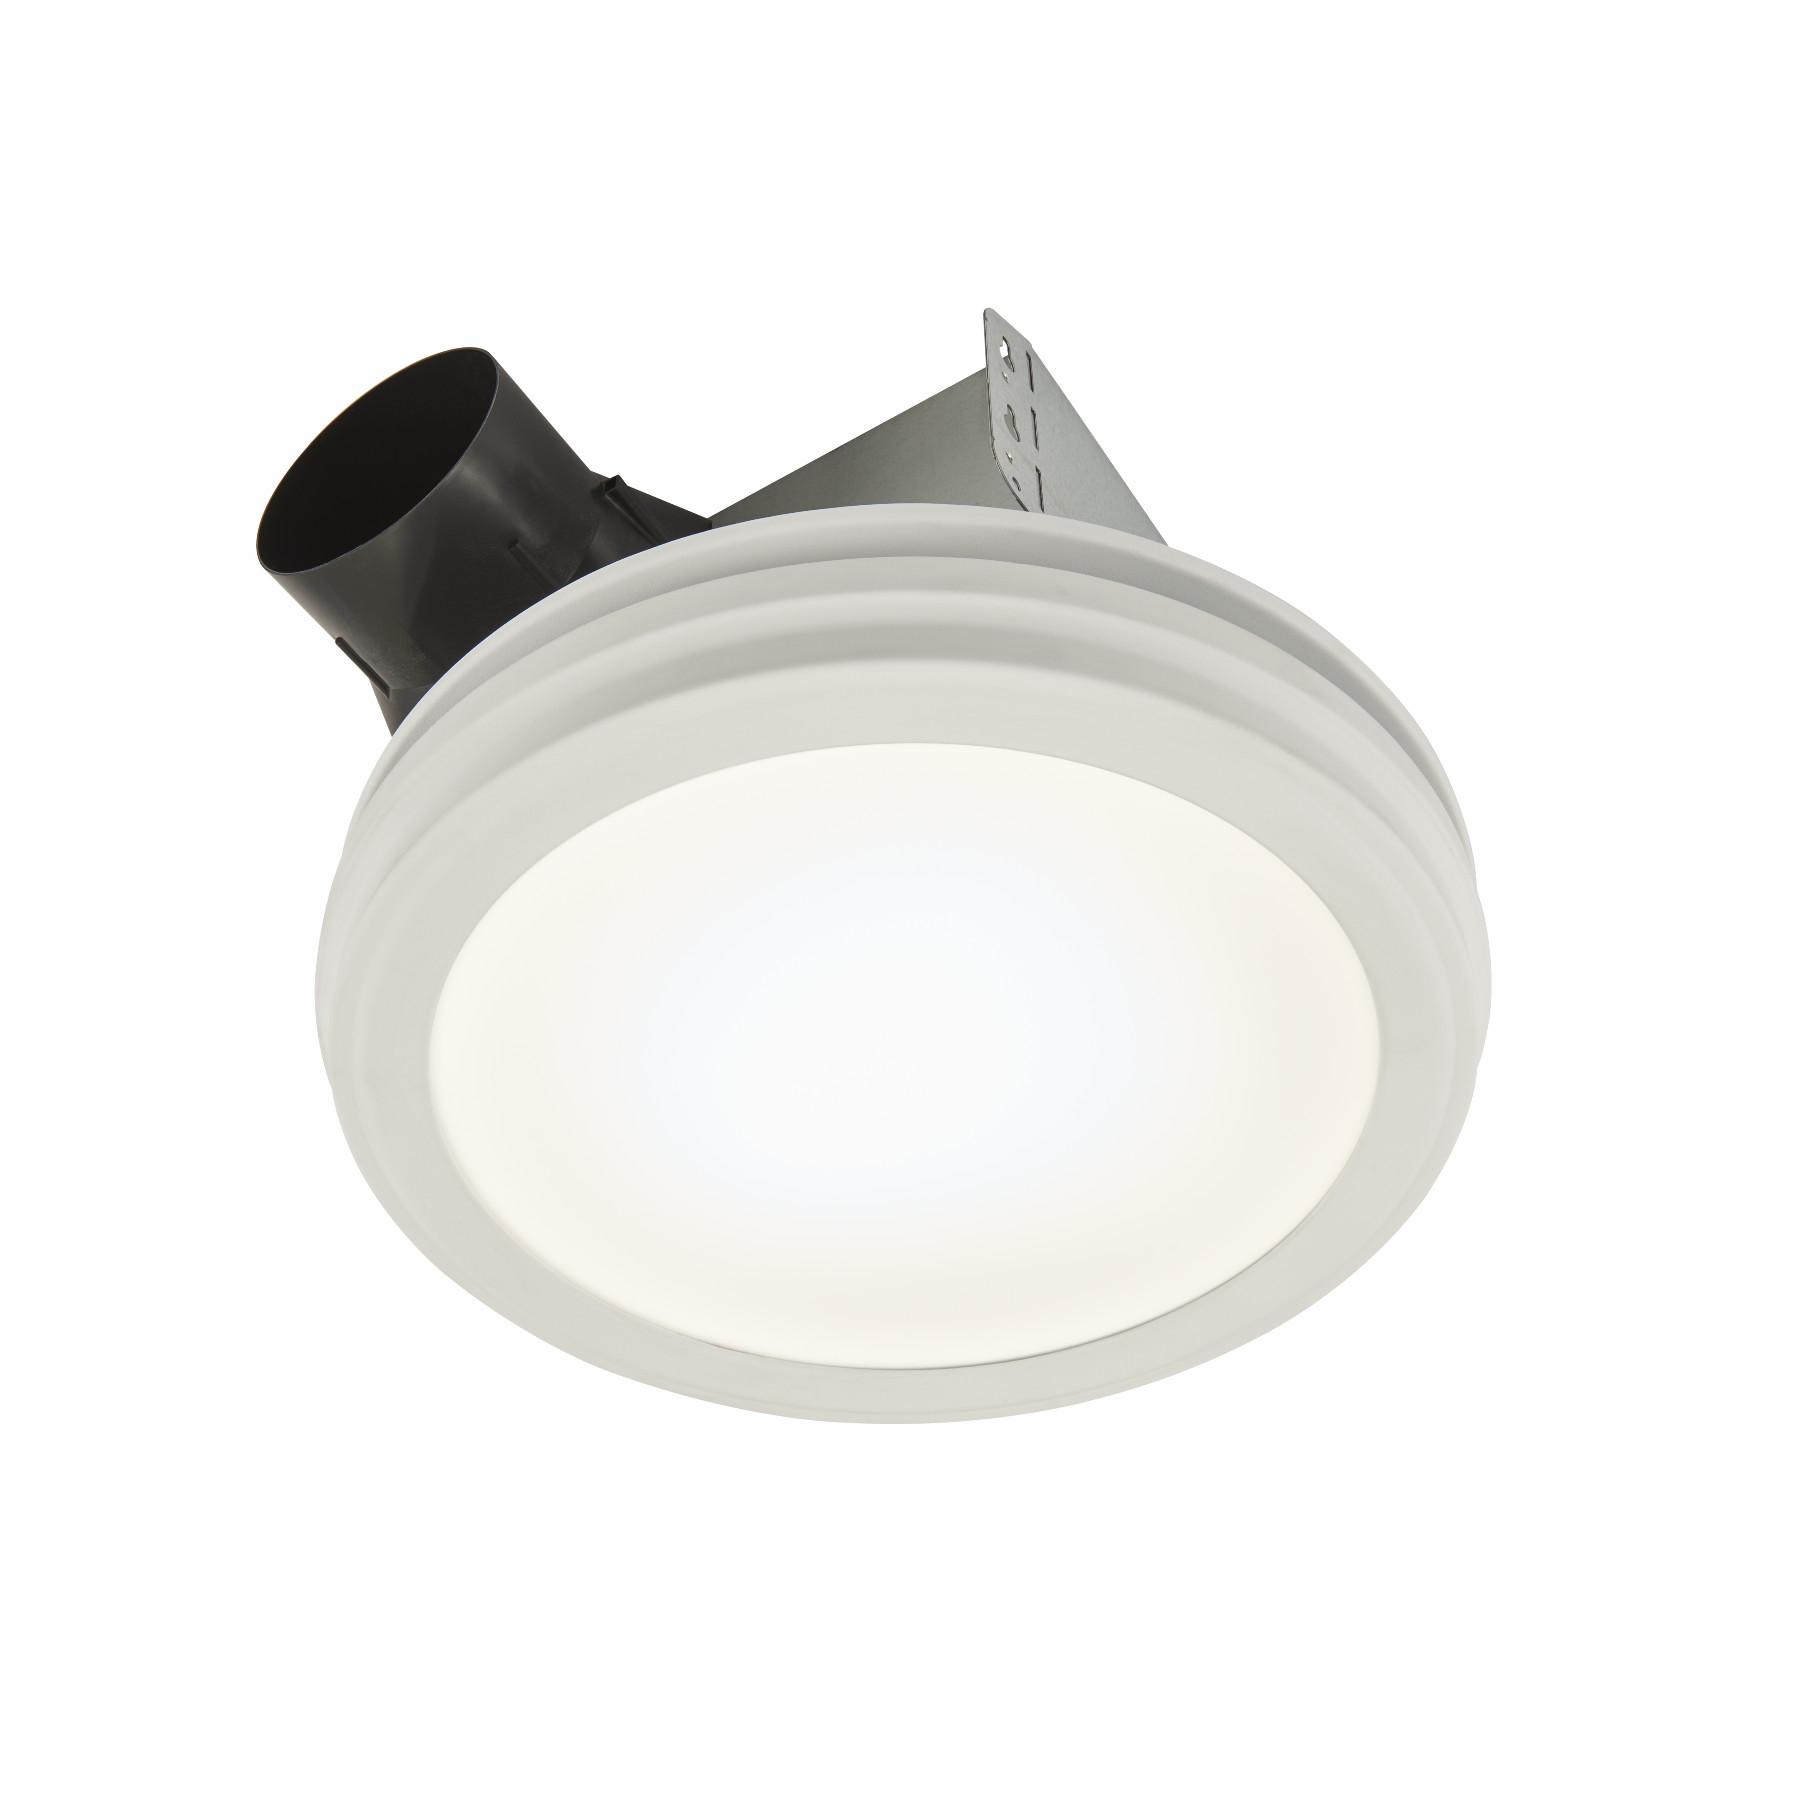 Quiet Round Bath Fan Bathroom Shower Exhaust Ventilation Vent Fan with Light New